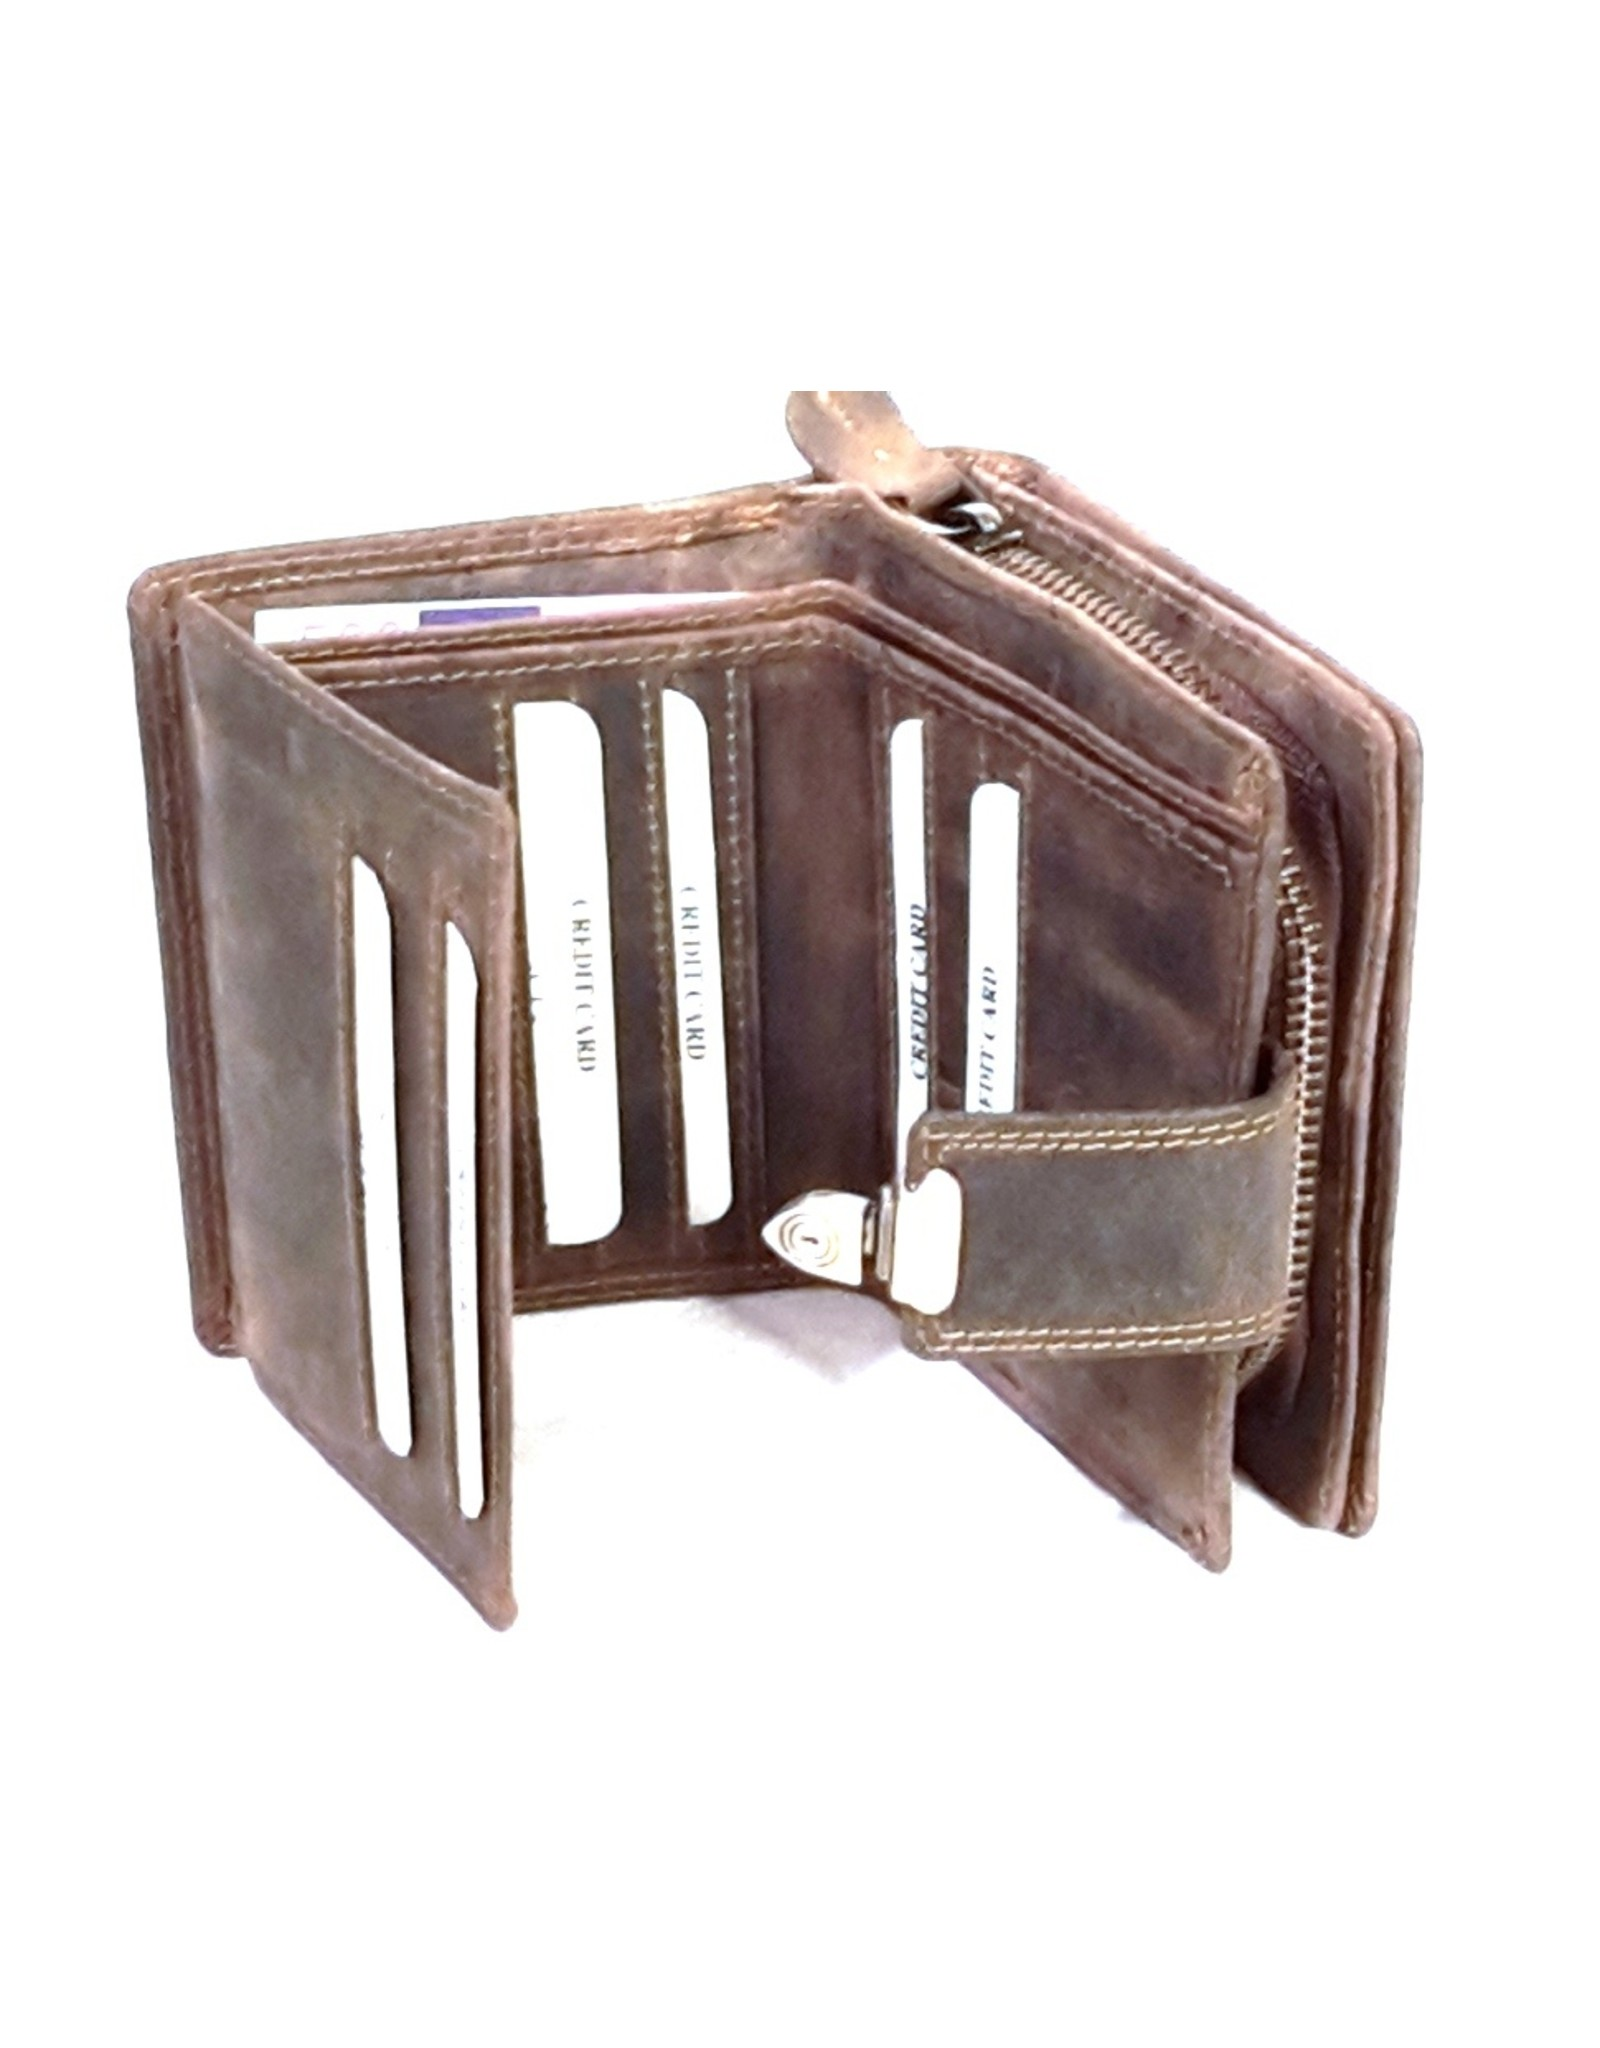 BestBull Leren Portemonnees - Leren portemonnee met shuifsluiting en ritsvak